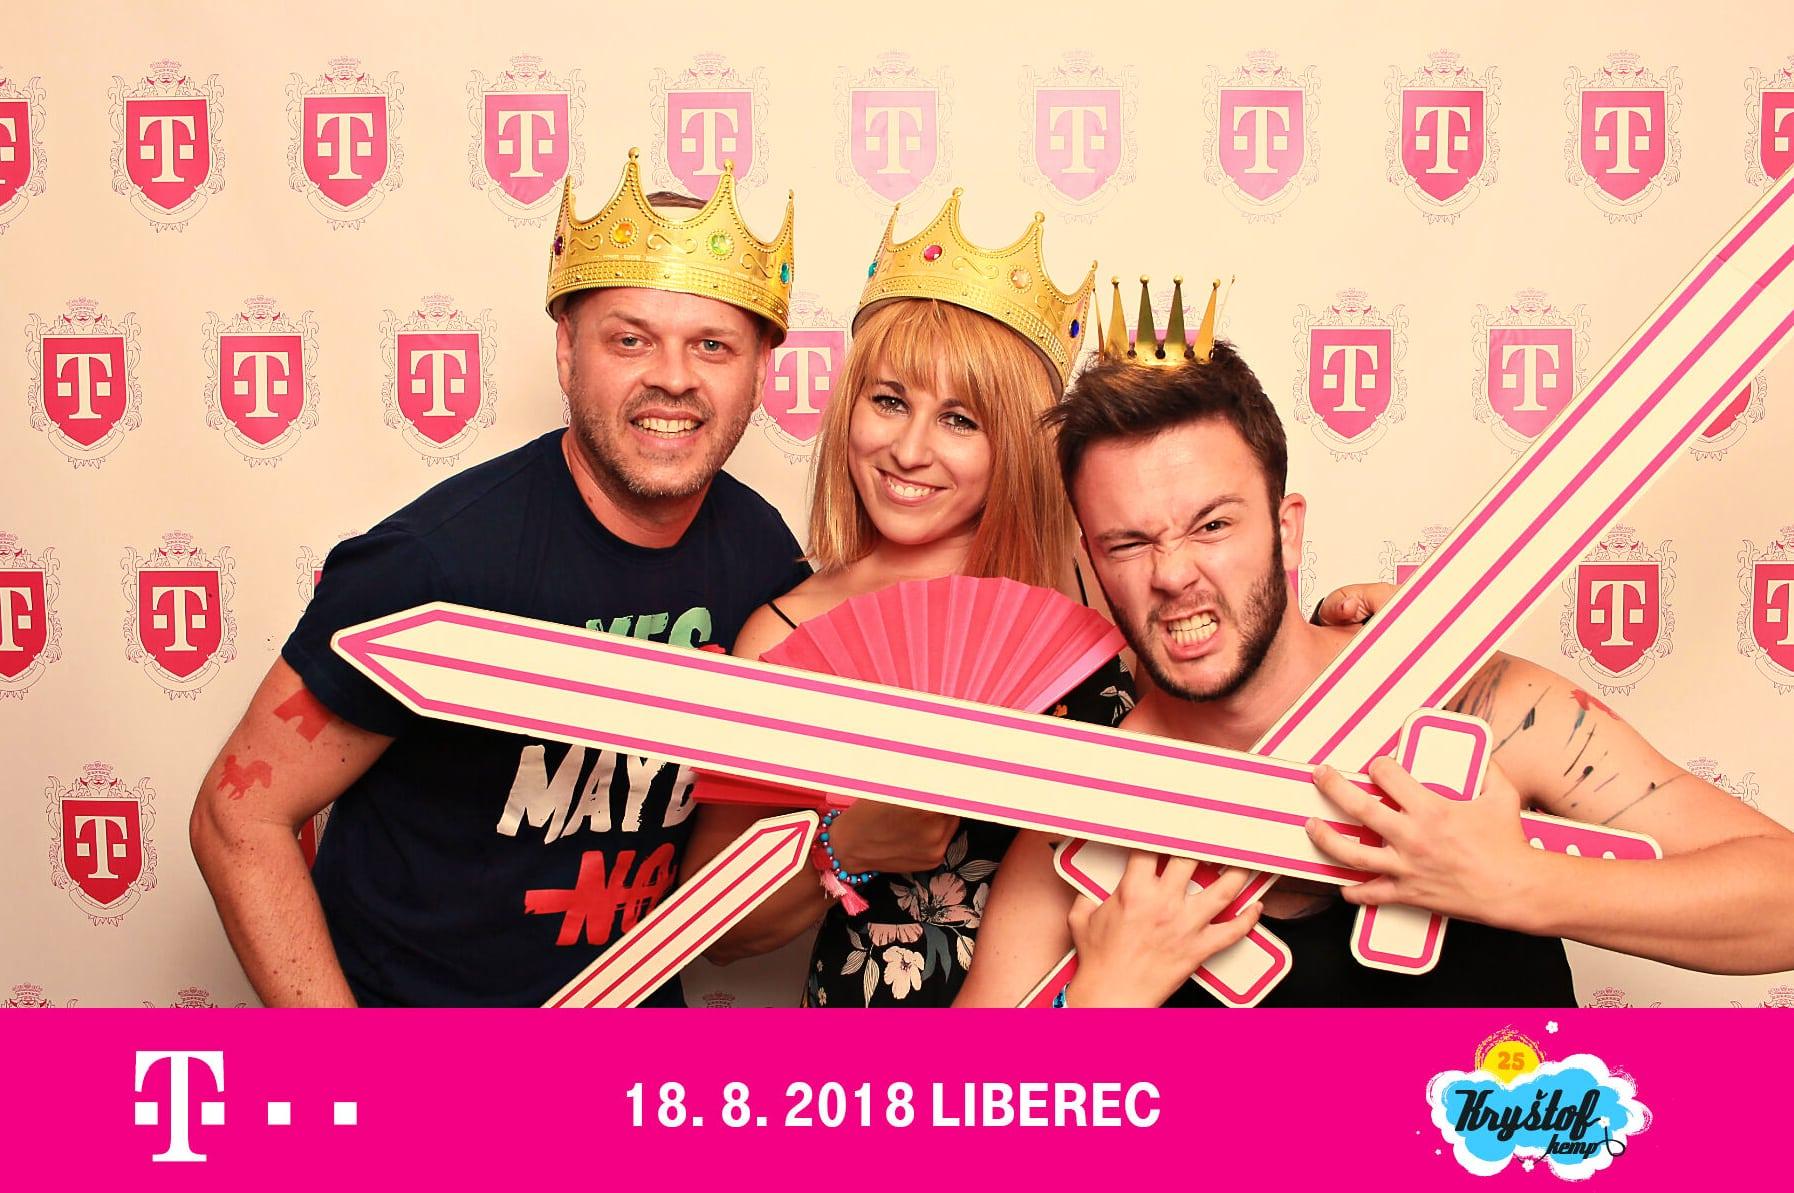 fotokoutek-firemni-vecirek-liberec-t-mobile-18-8-2018-471563